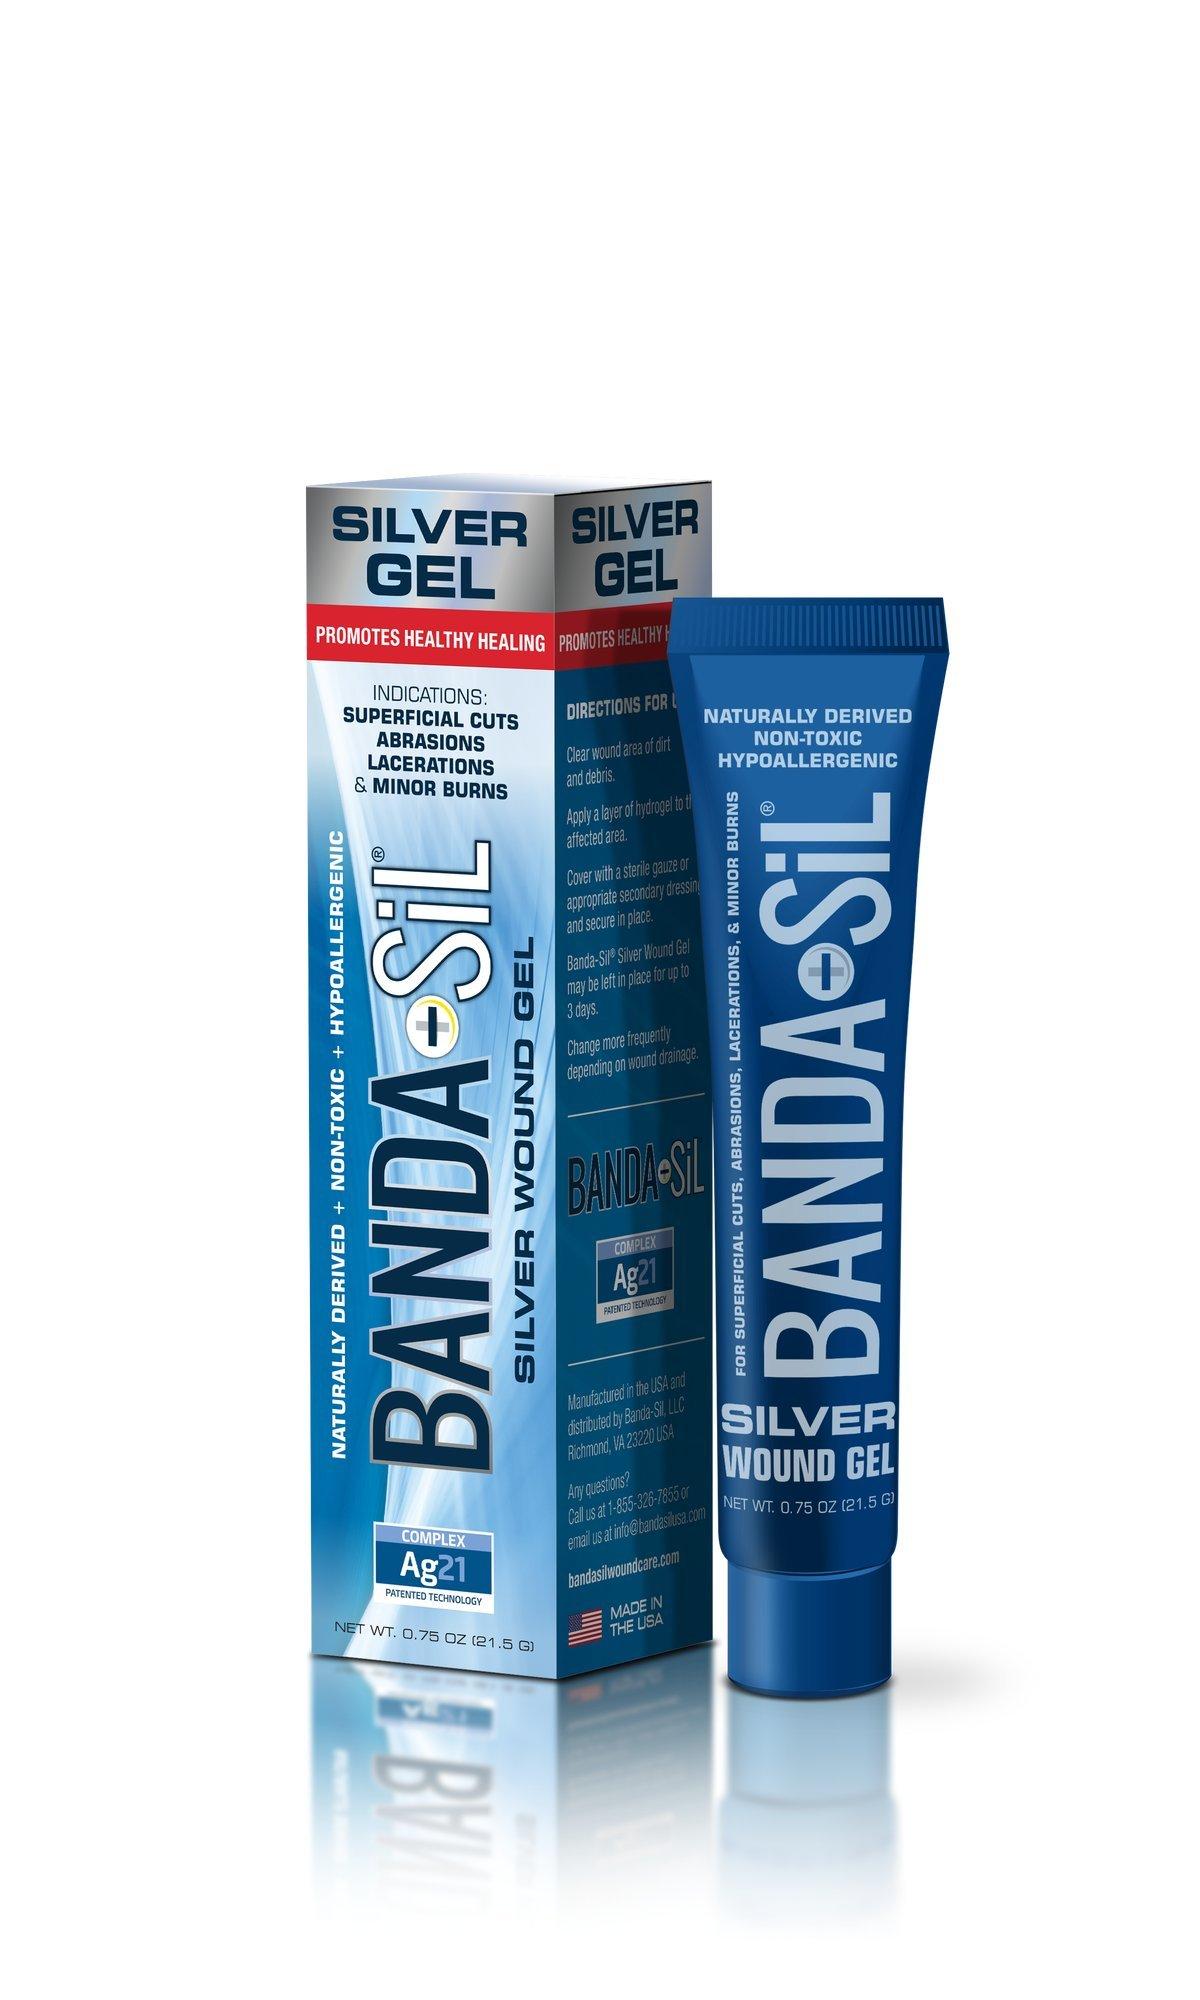 BANDA-SiL Silver Wound Care Gel, 0.75 oz by BANDA-SiL® (Image #2)